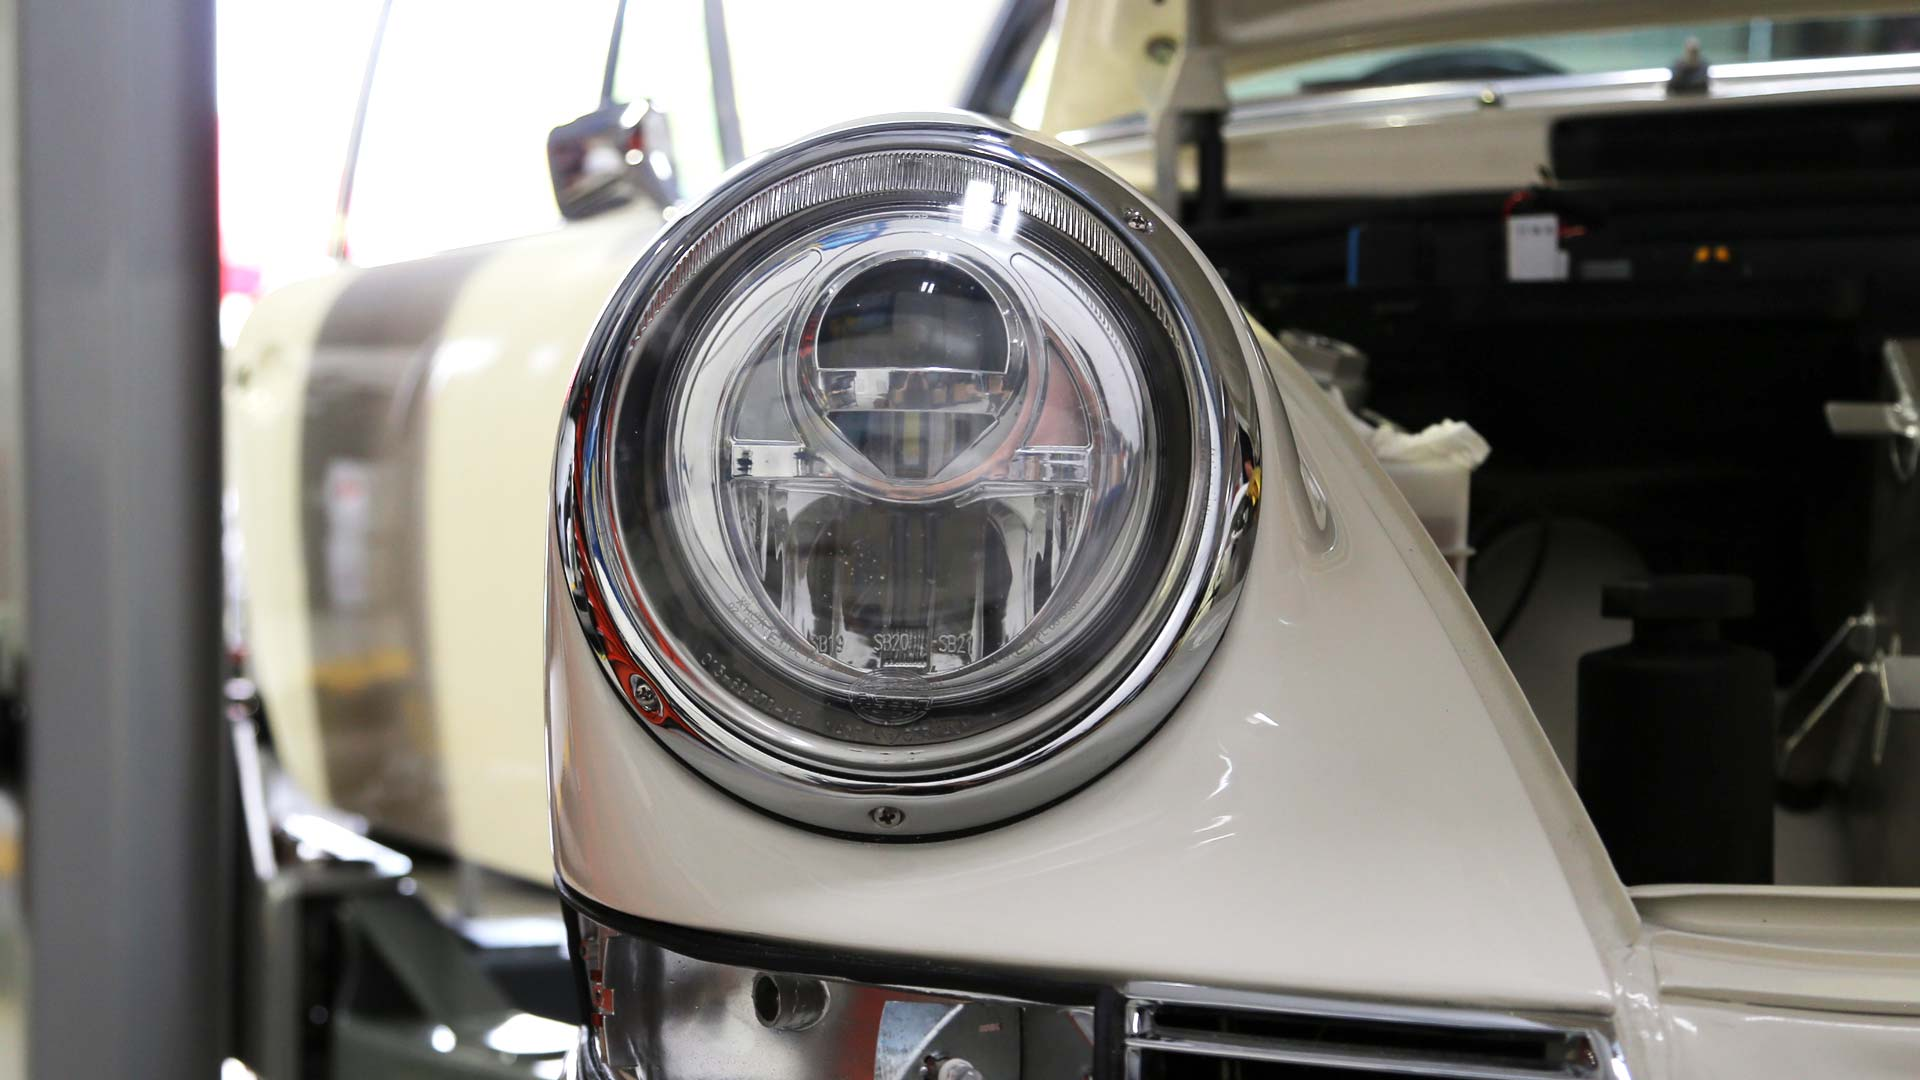 911 Headlights Rpm Lumetechnik Led Headlight Conversion Page 1 Porsche Classics Pistonheads